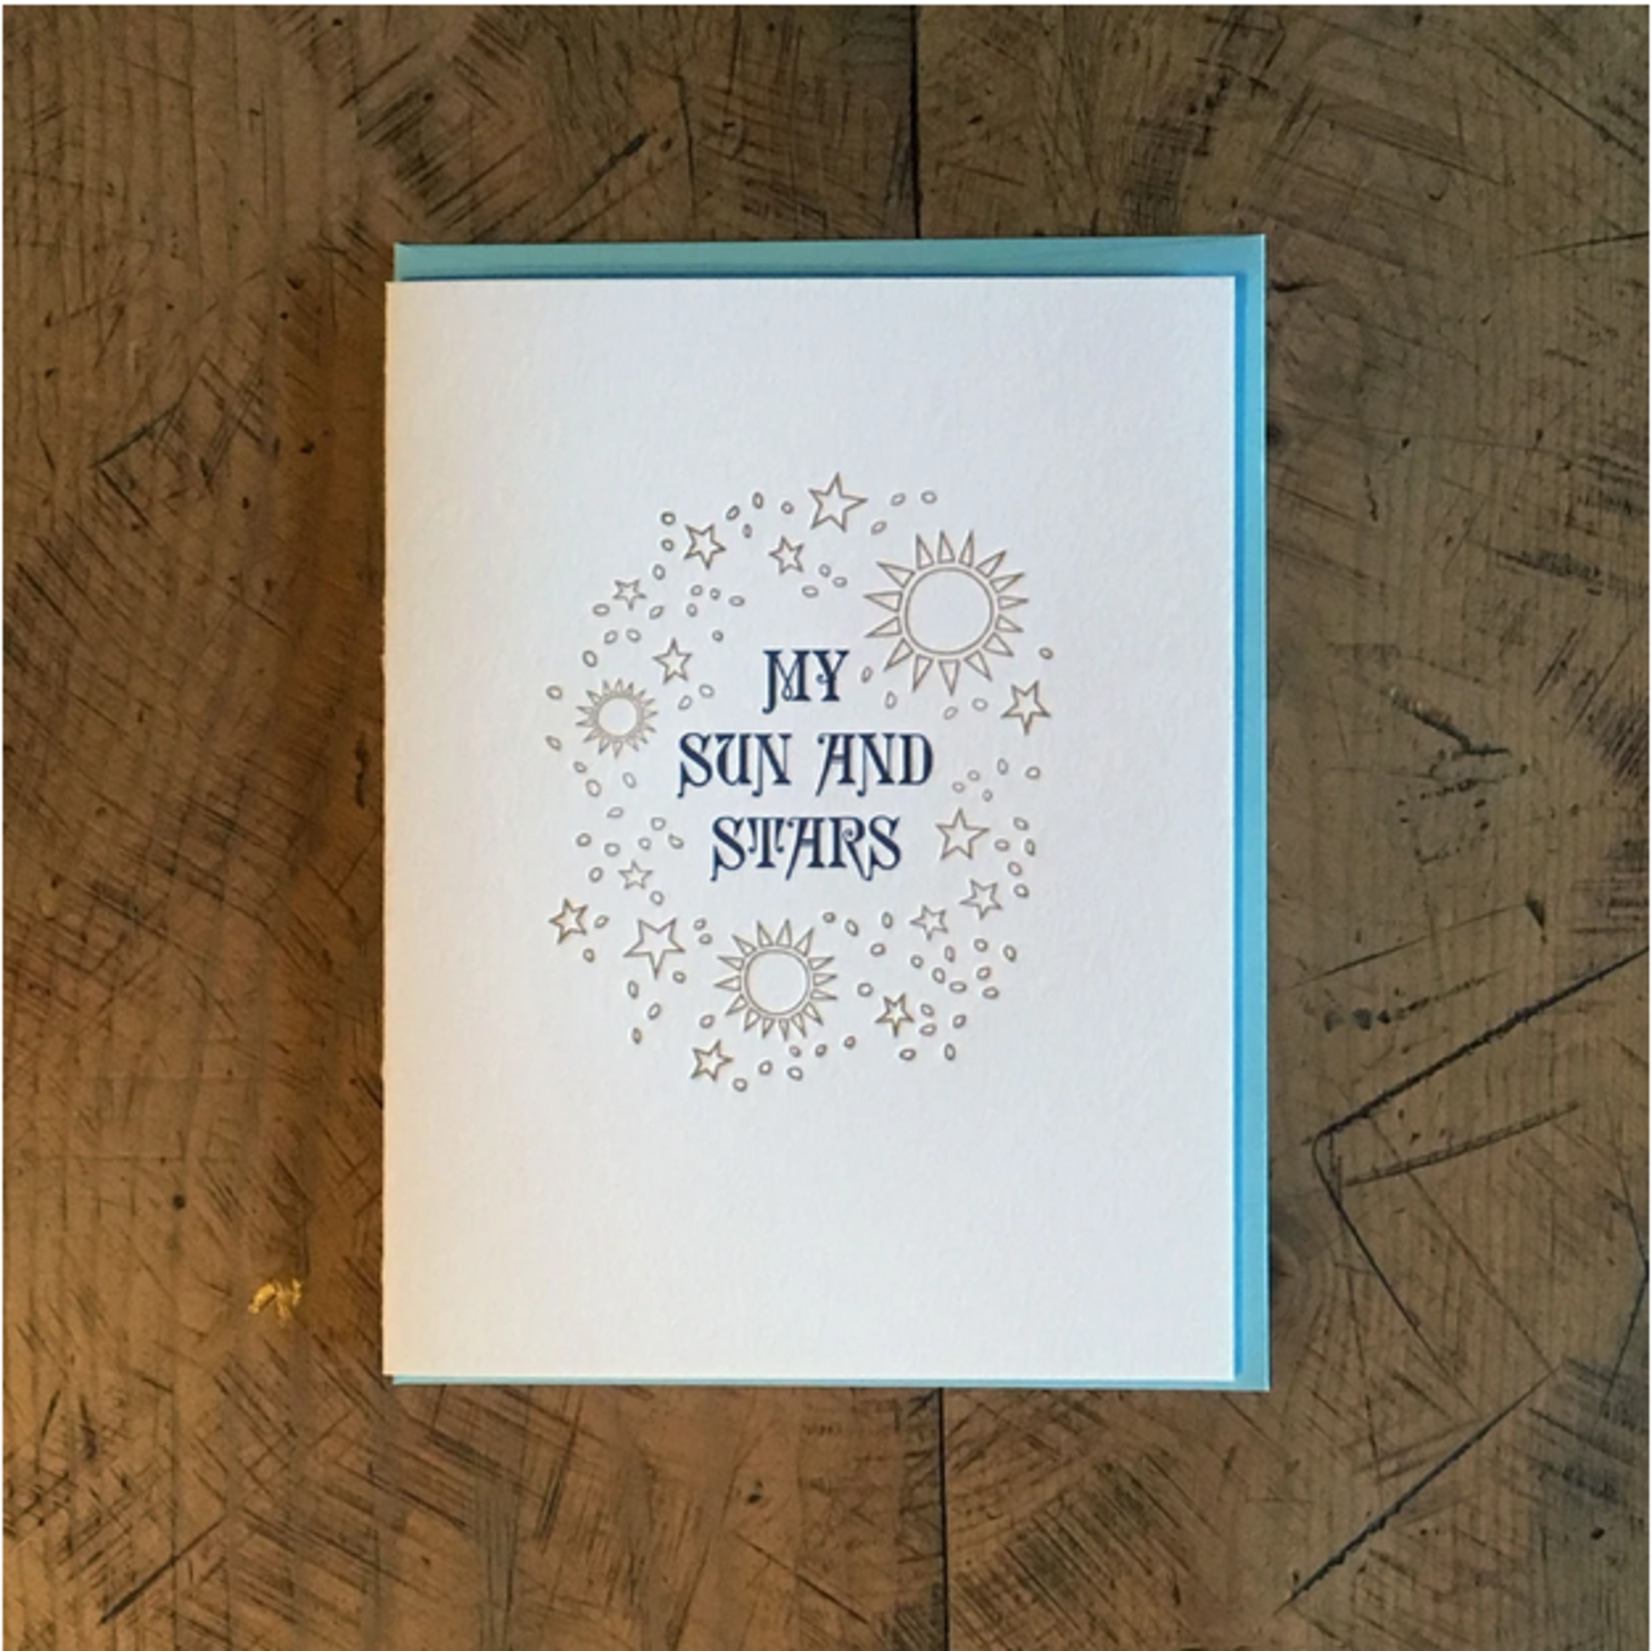 Green Bird Press Game Of Thrones: Sun + Stars Letterpress Greeting Card